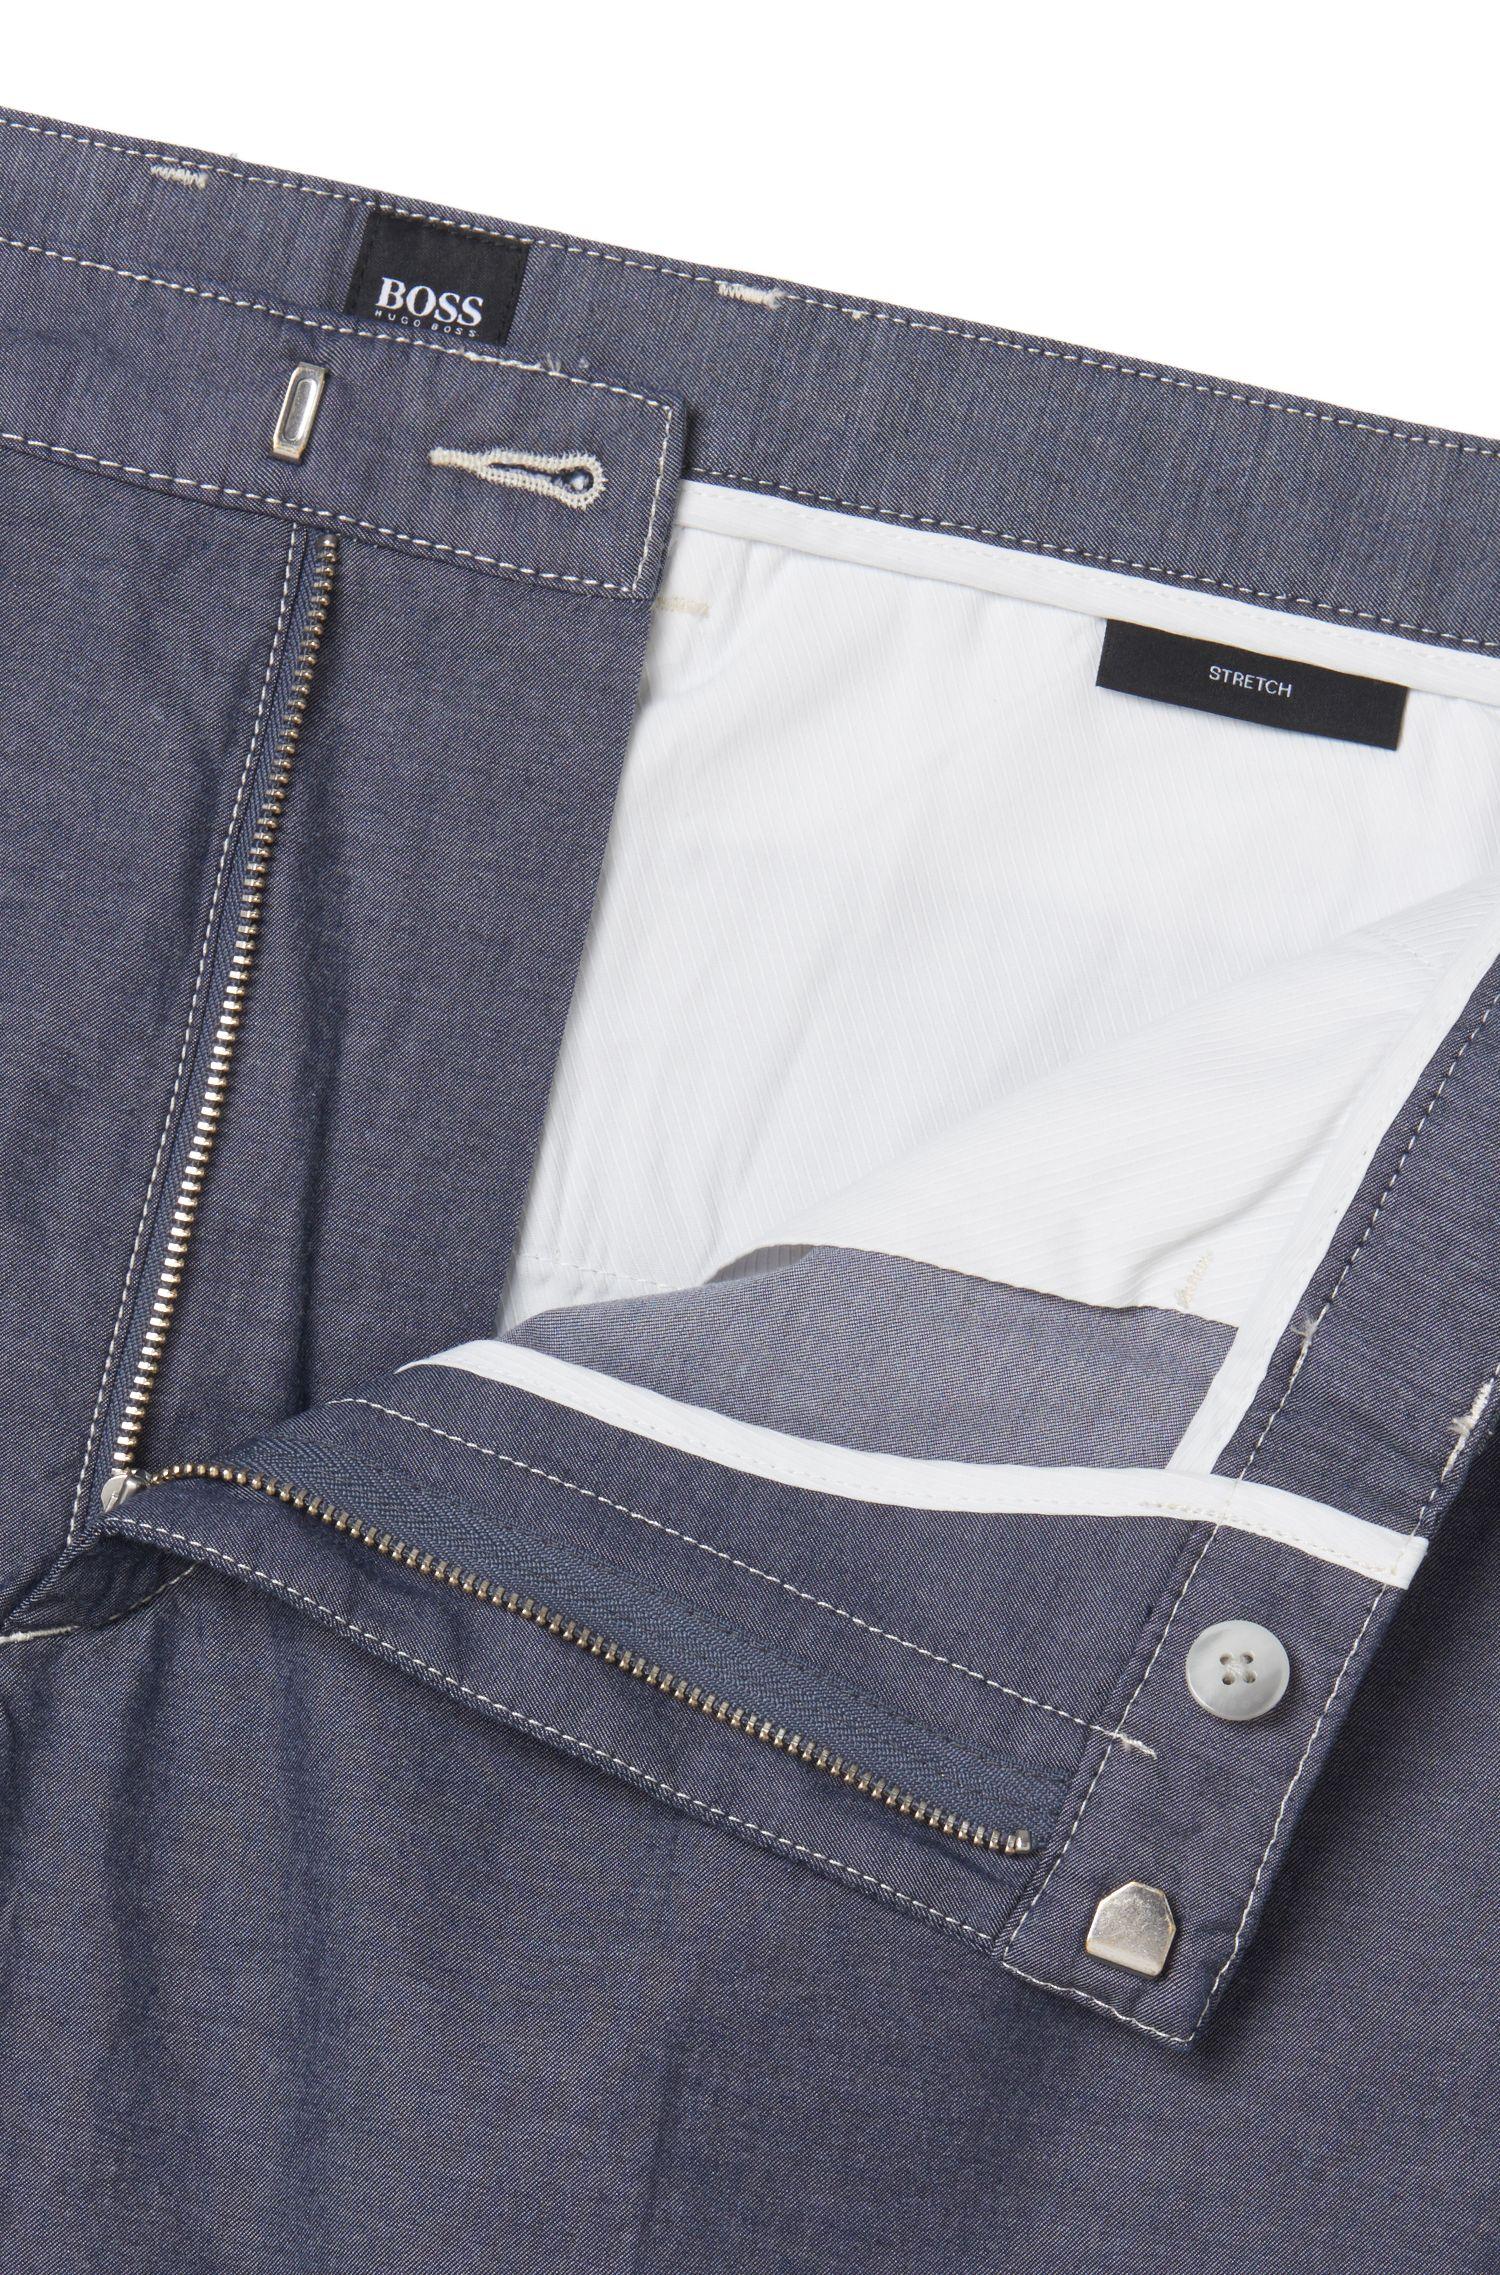 Stretch Cotton Chino Pant | Kaito3-Stitch-W, Dark Blue